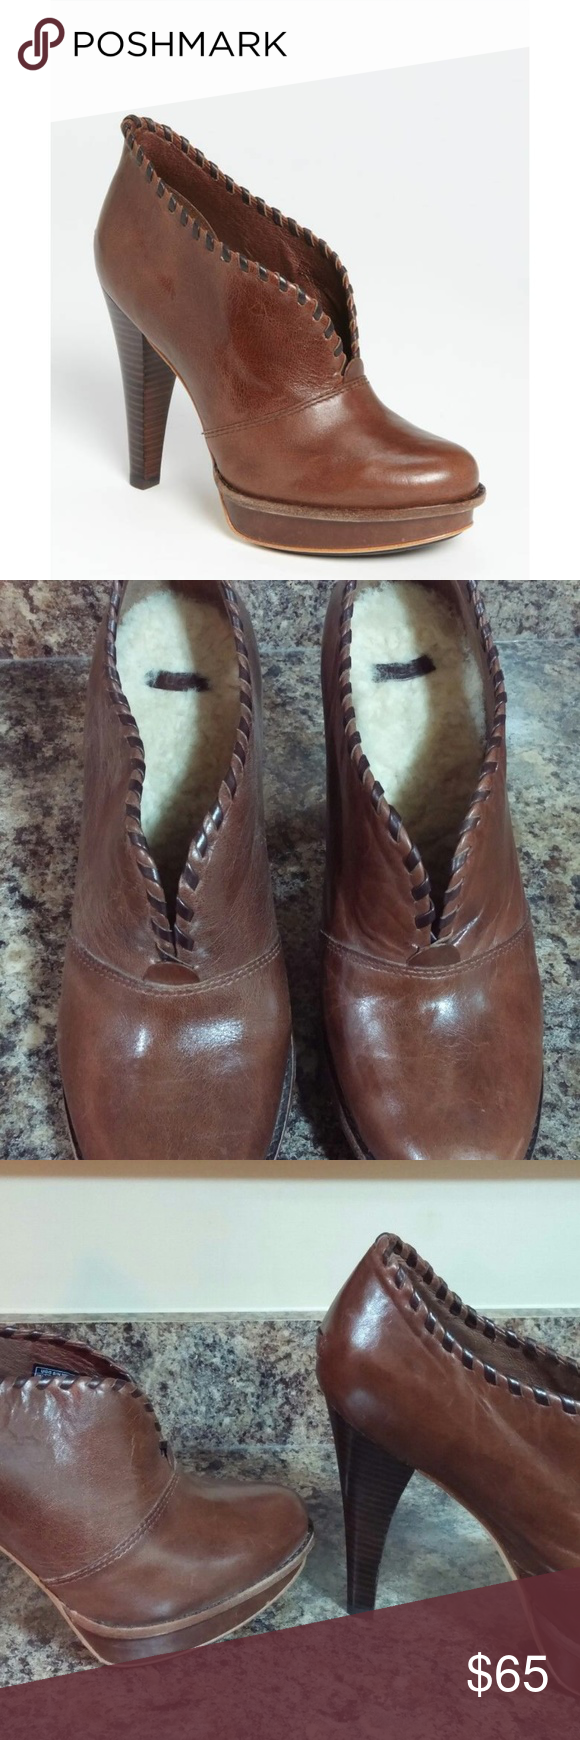 dfbd2b8b8 UGG Jamison Platform Bootie UGG Australia Name: Jamison Color: Brown Size:  39 (9 US) Leather High Heel Bootie SUPER comfortable shoes!